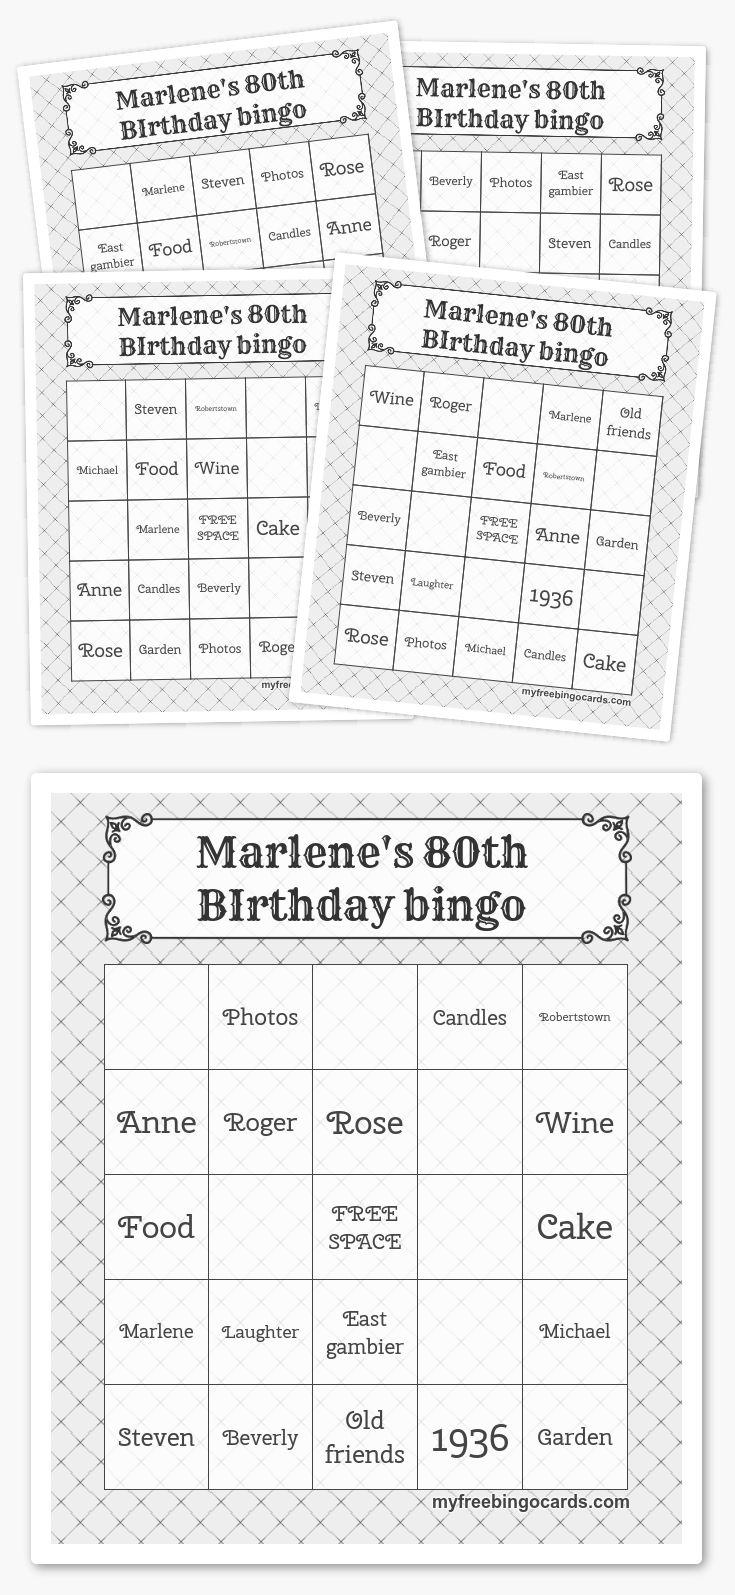 Make your own free bingo cards at myfreebingocards.com